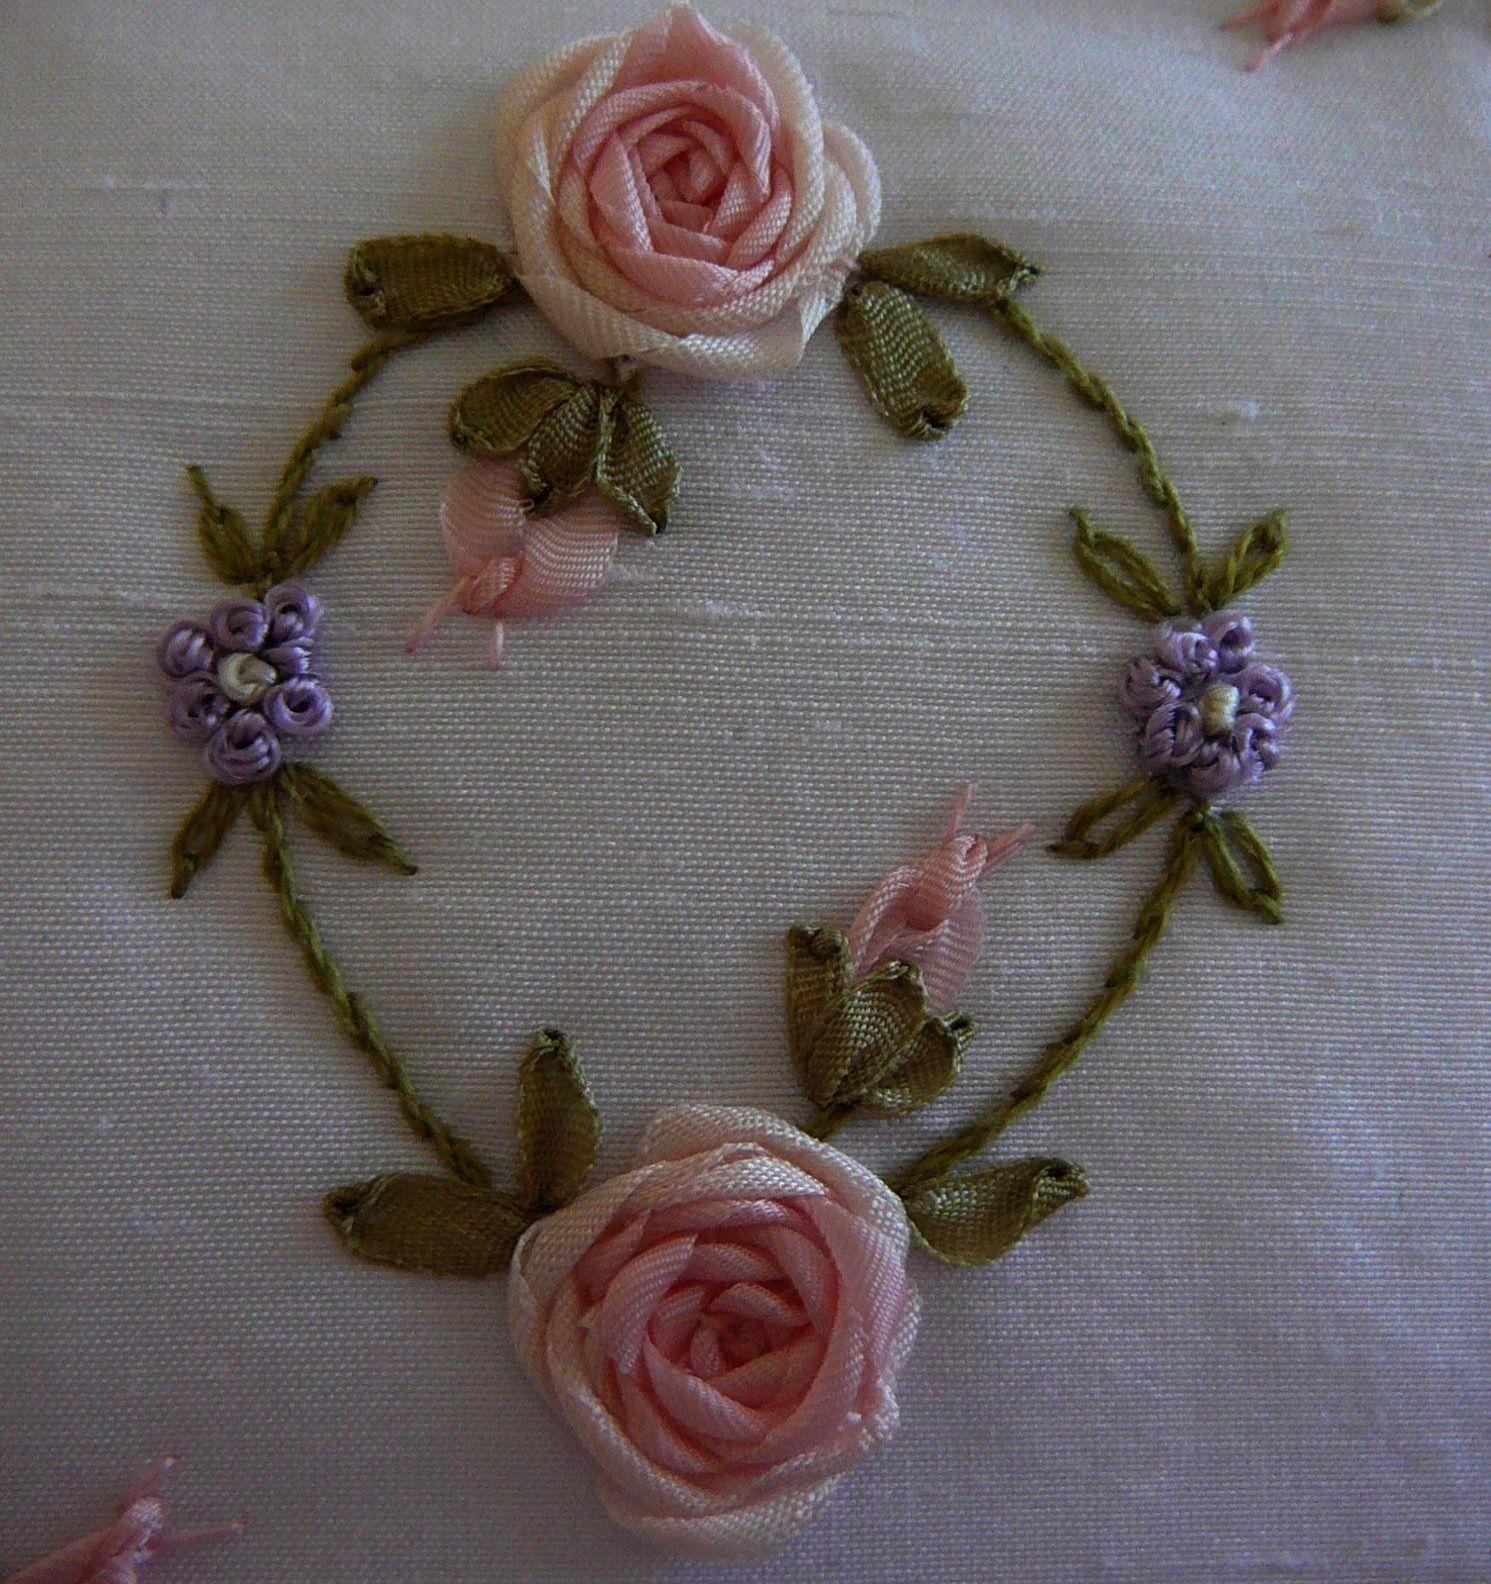 Silk Ribbon Embroidery Supplies Australia Silk Embroidery Floss